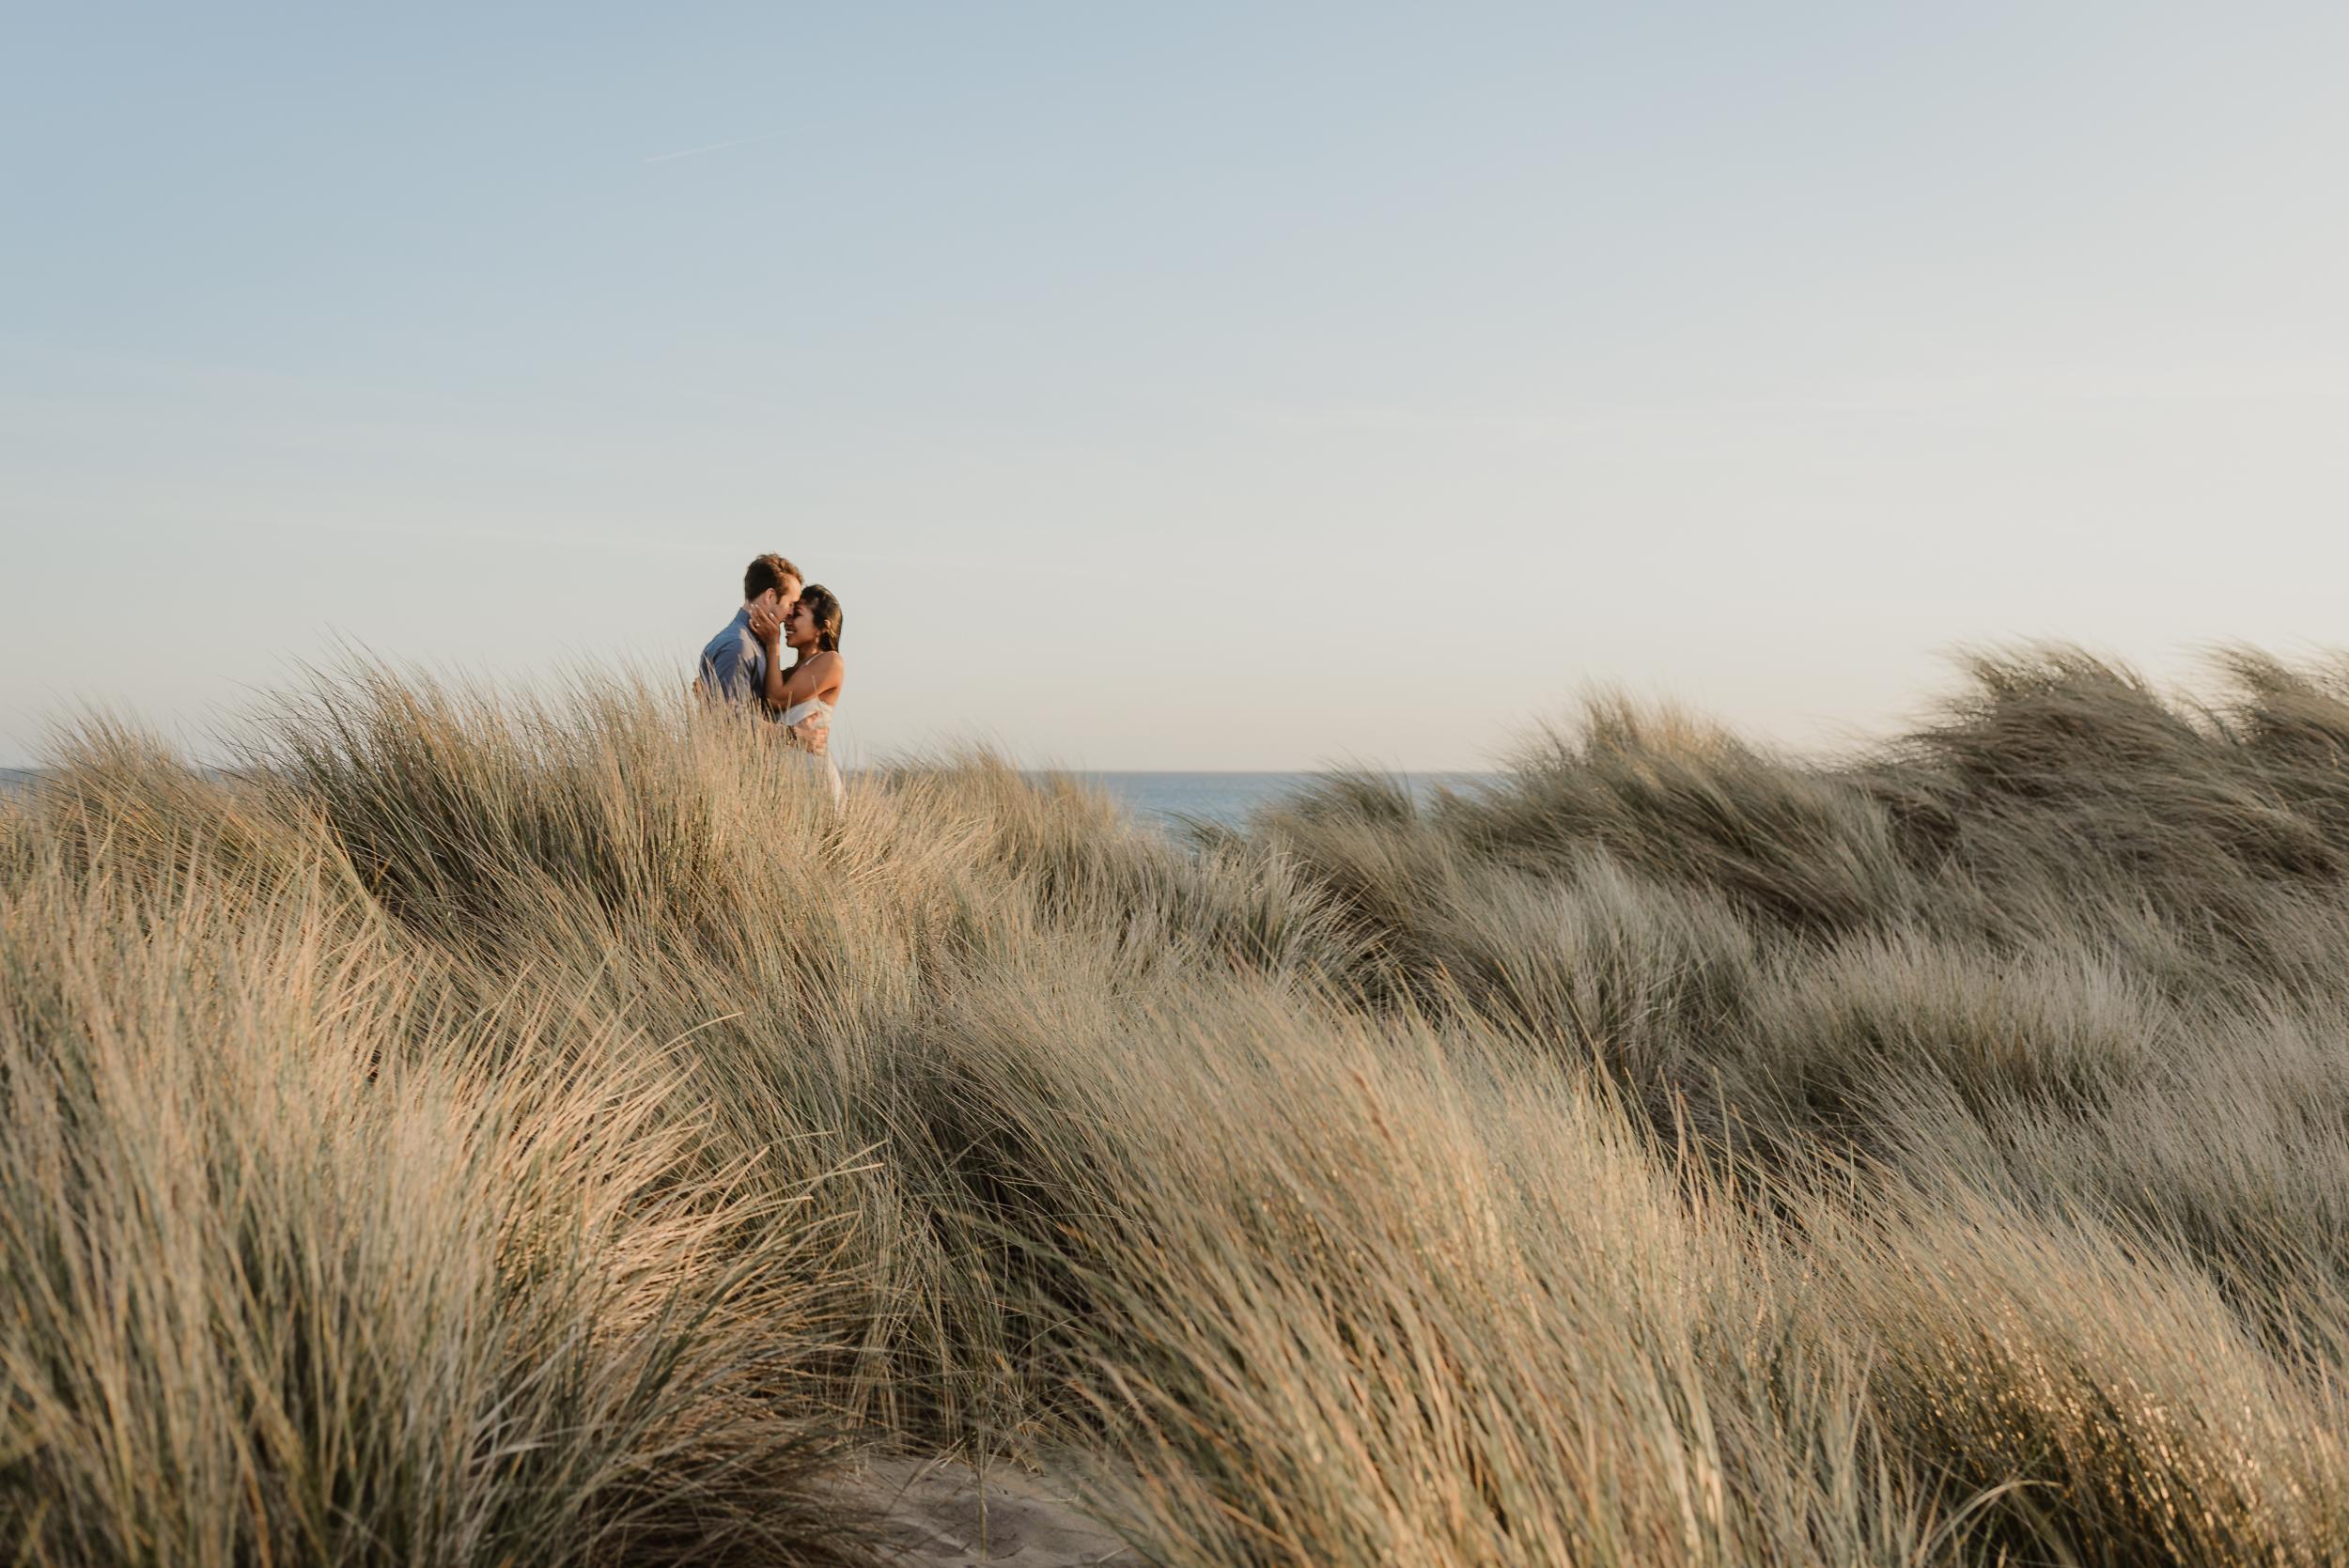 21-point-reyes-national-seashore-engagement-shoot-vivianchen-143.jpg